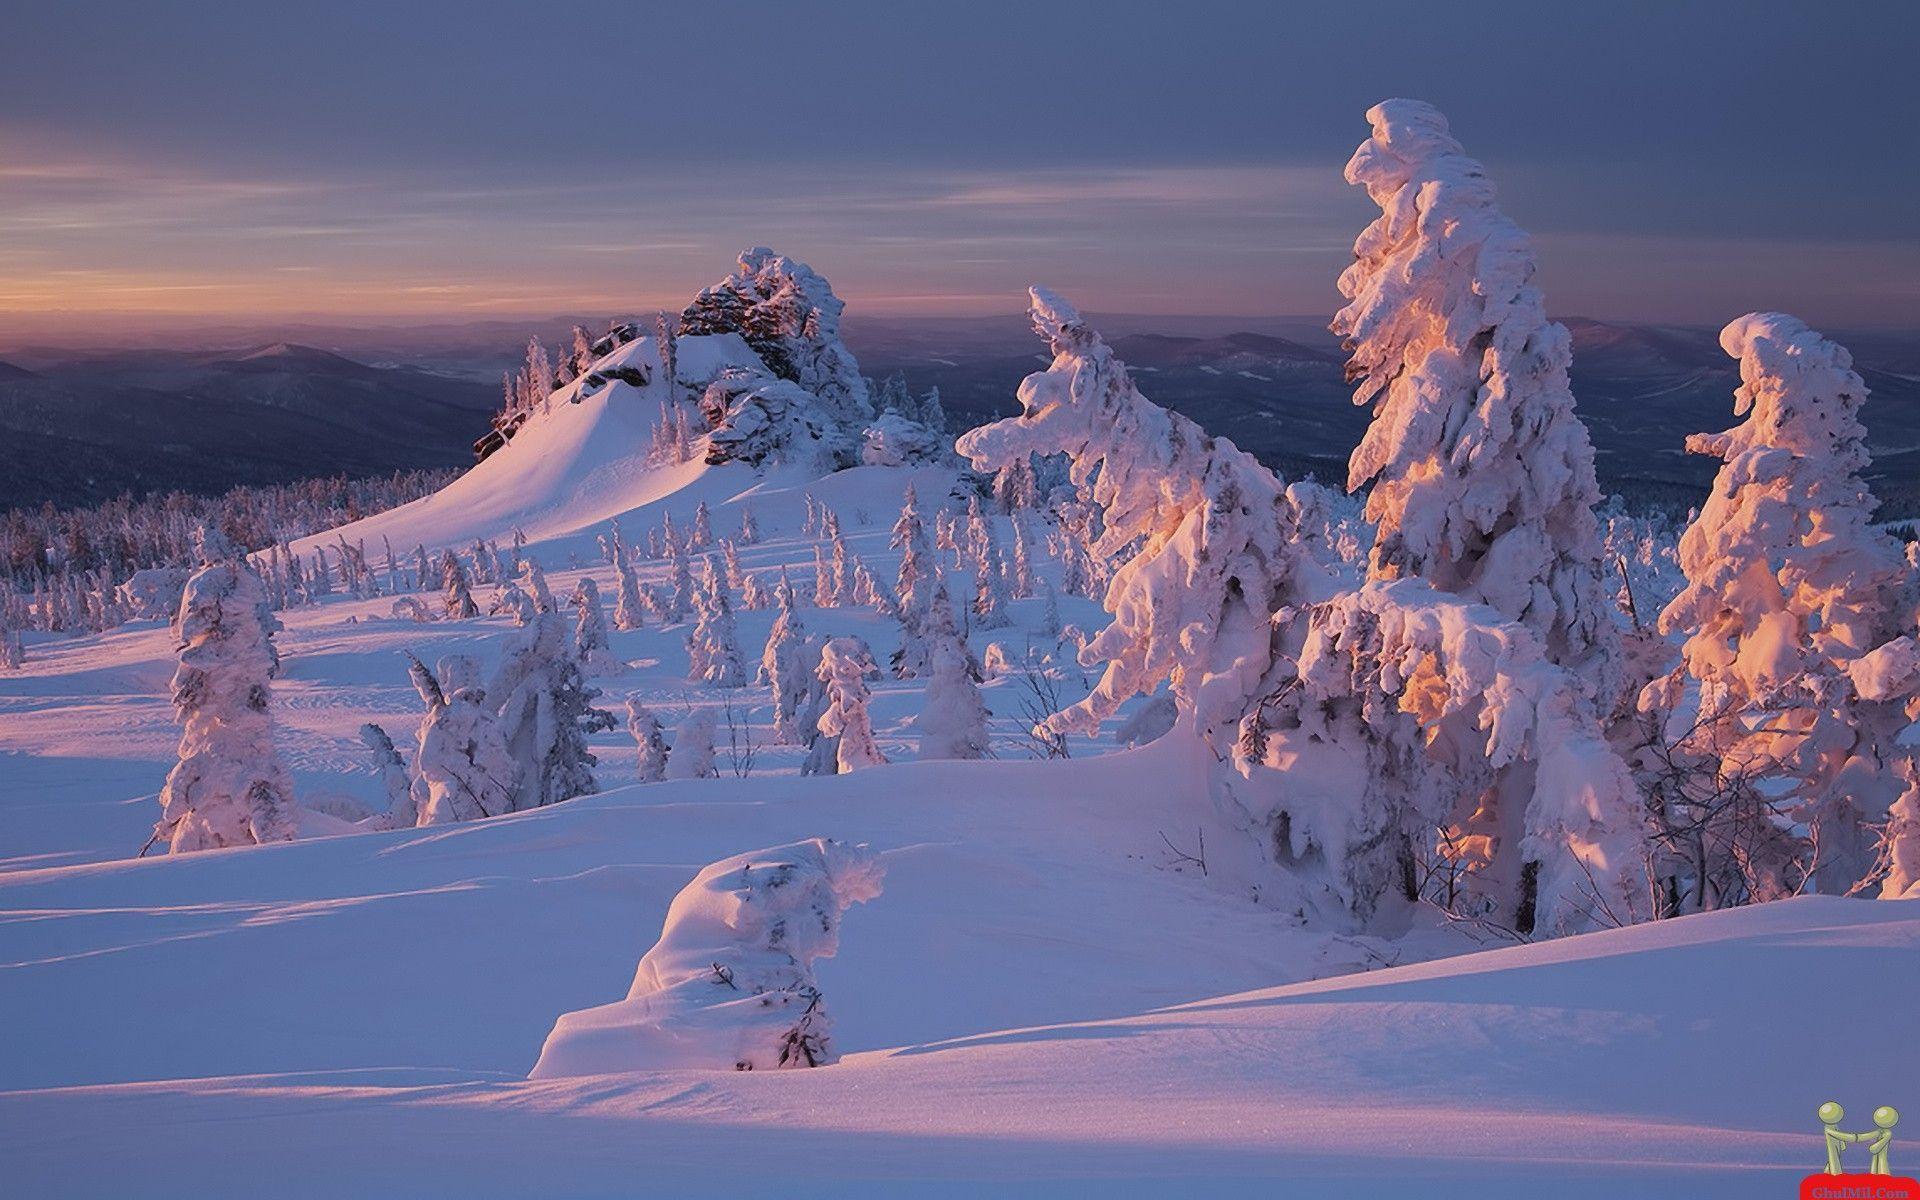 ilona wallpapers beautiful snowy - photo #48